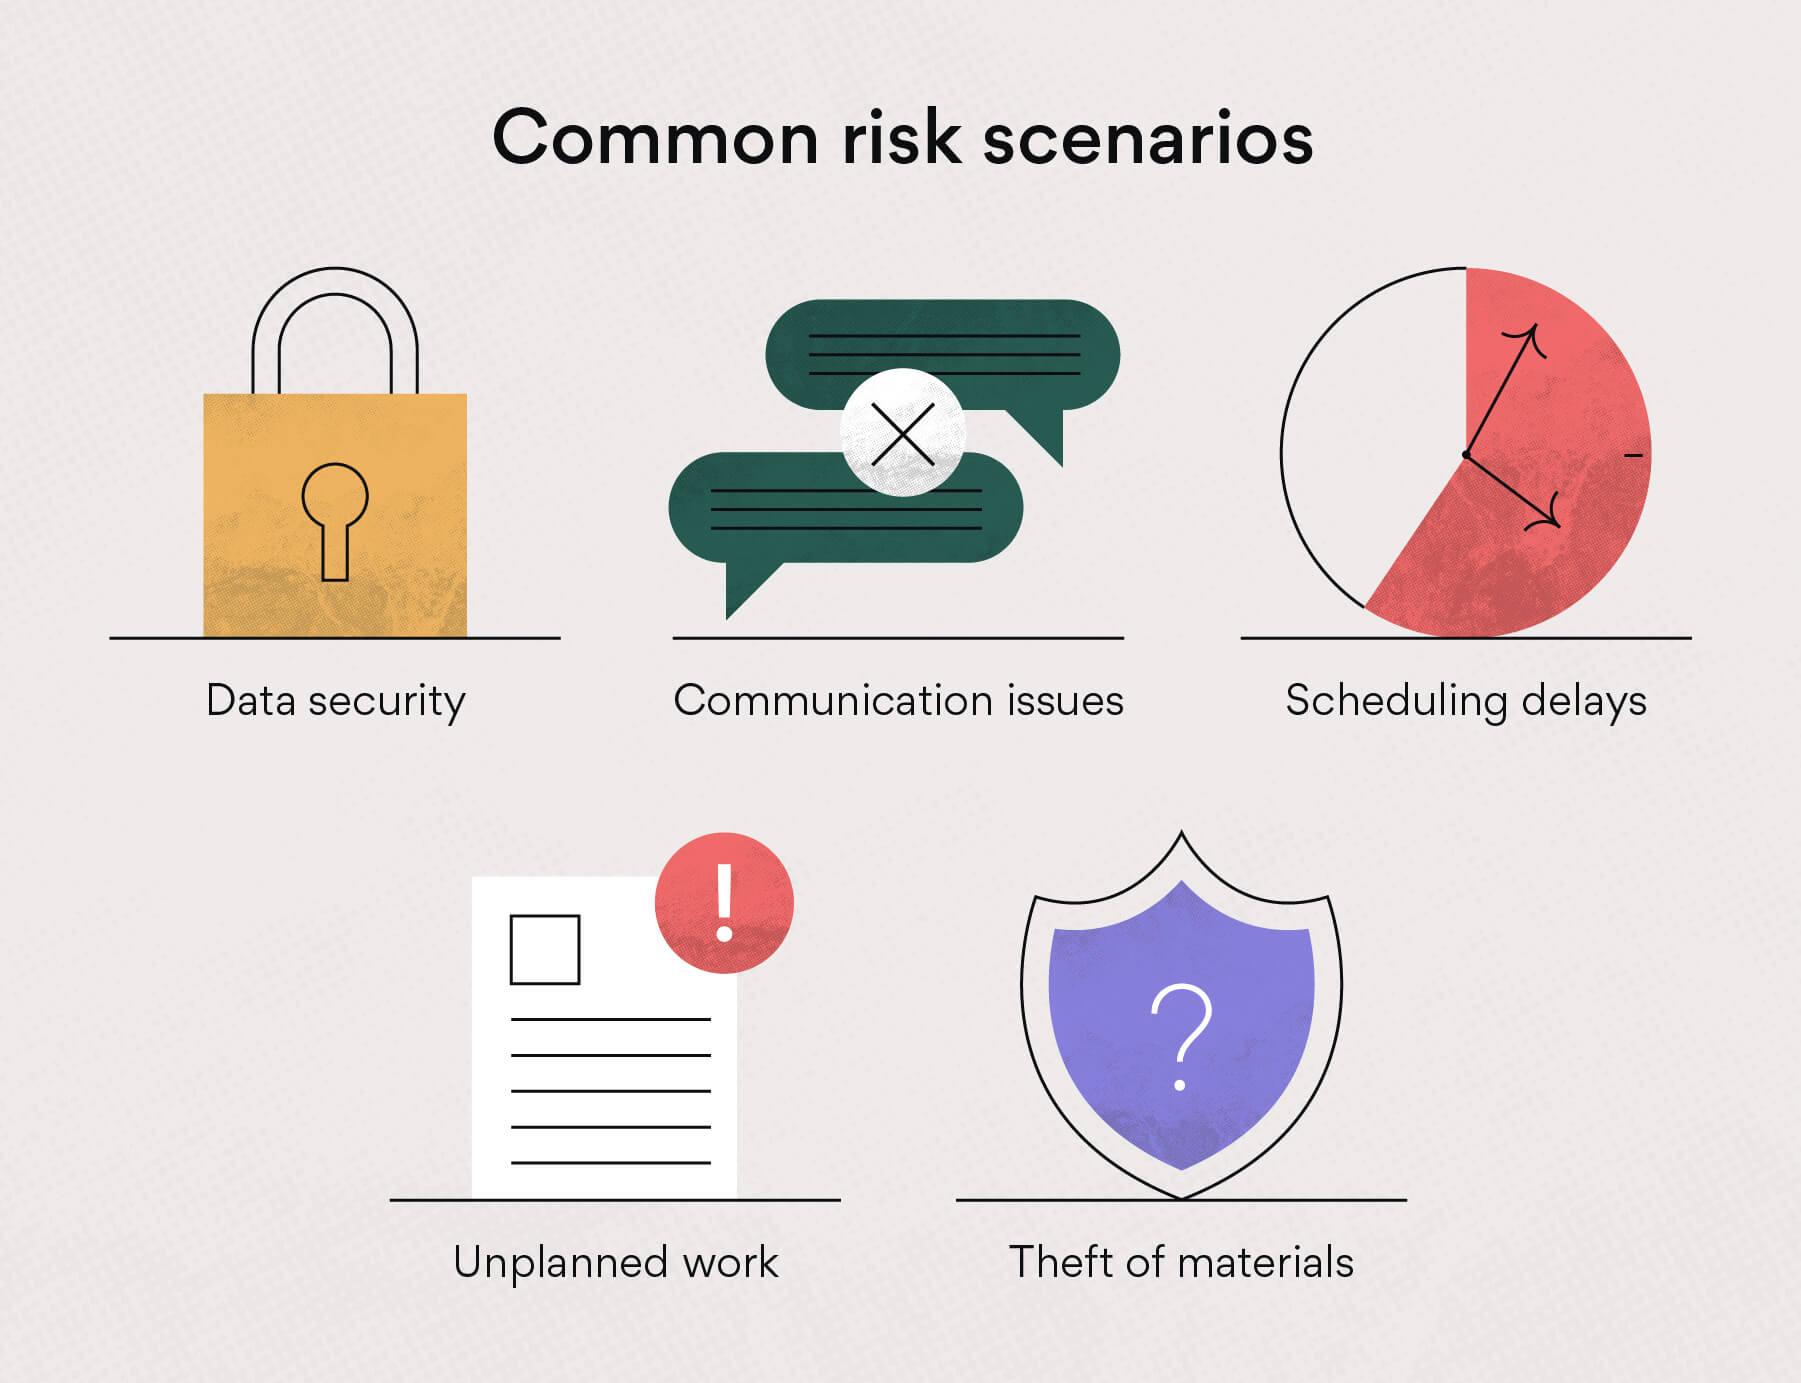 Common risk scenarios